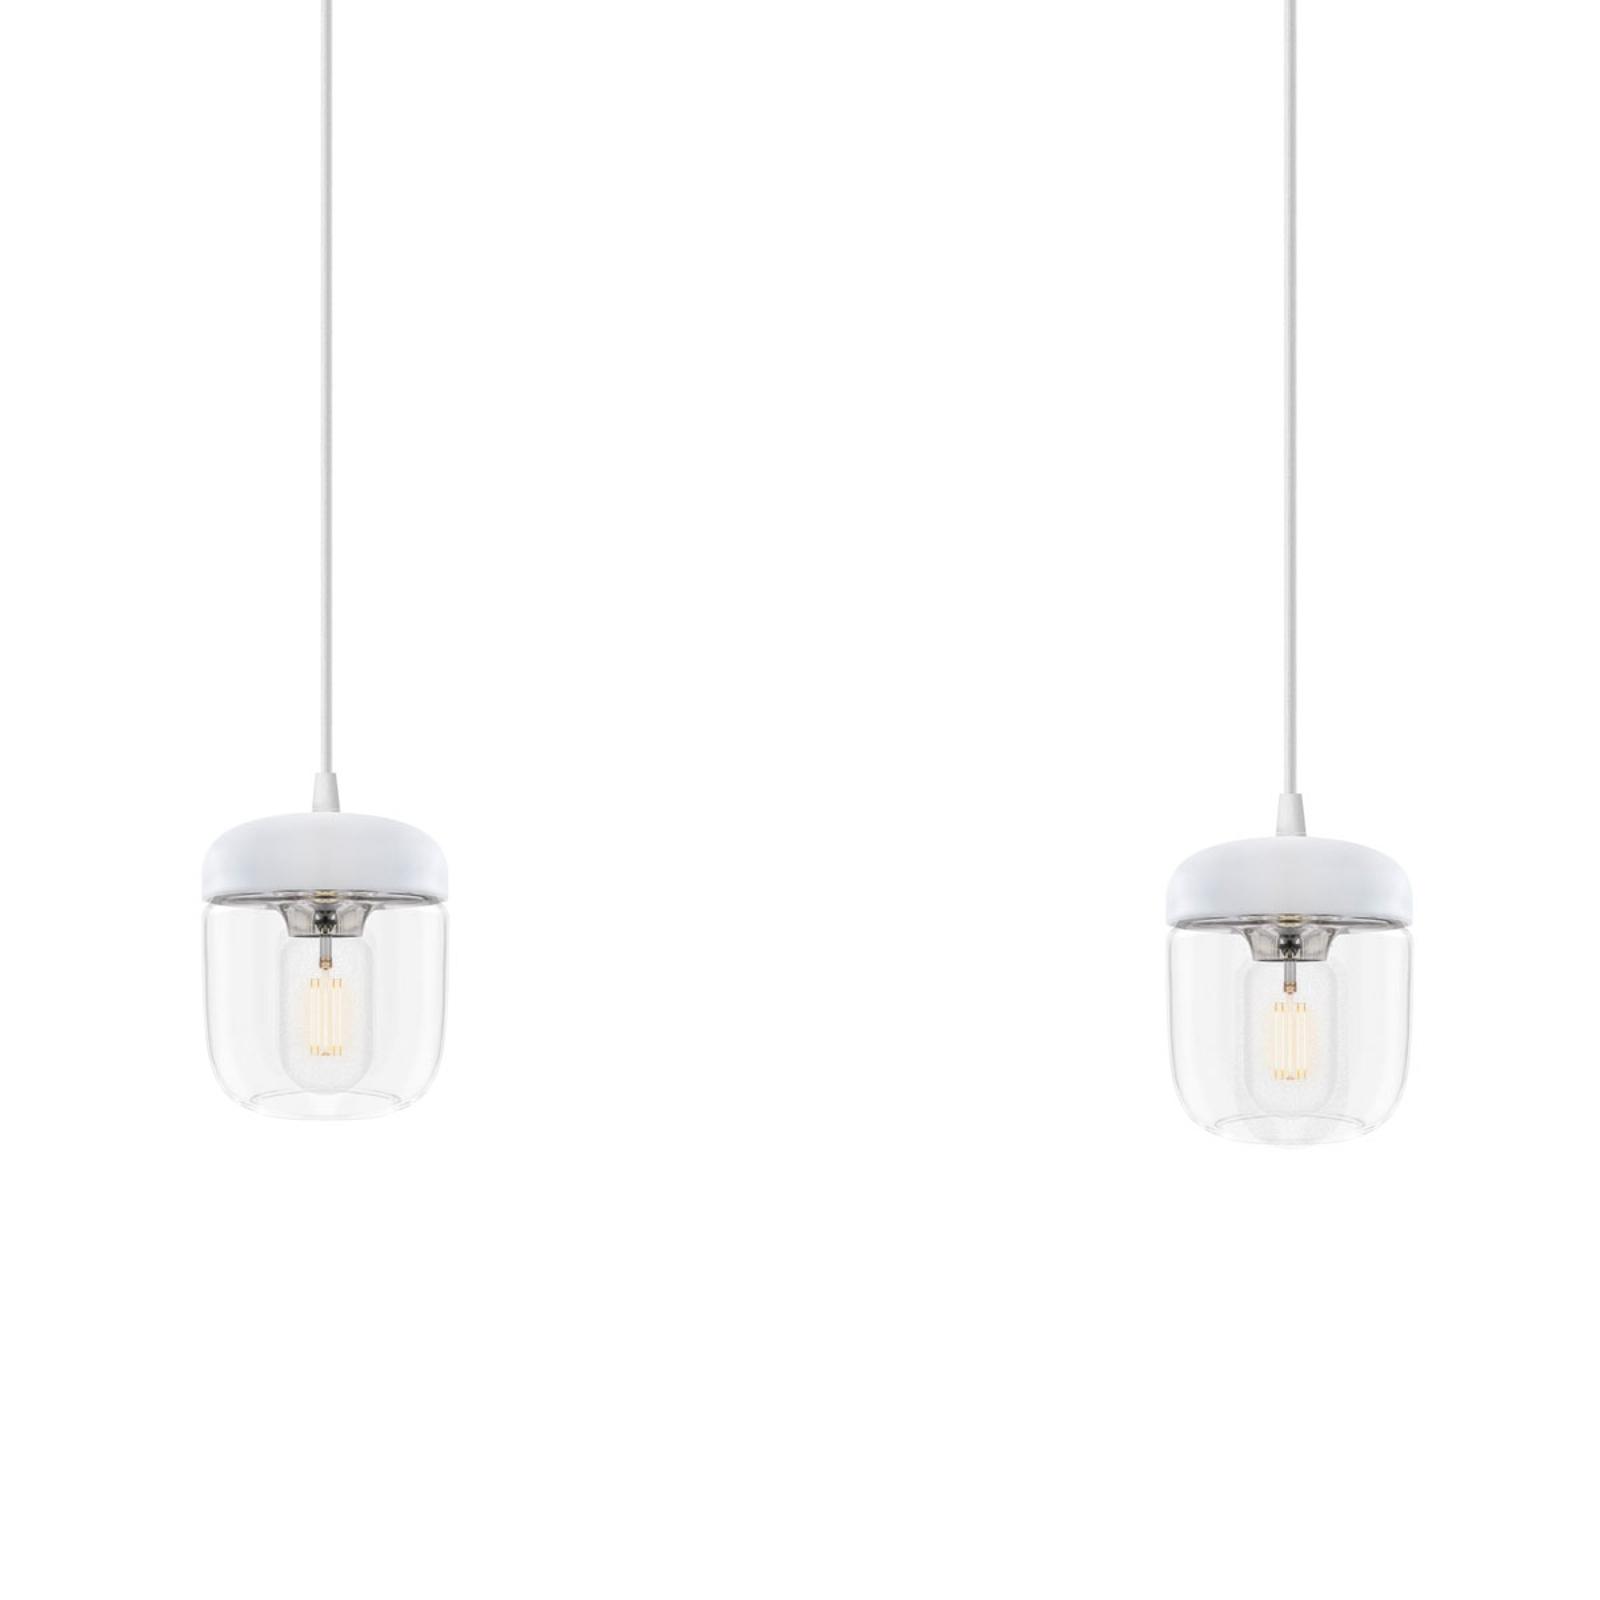 UMAGE Acorn lampa wisząca biała/stal, 2-punktowa